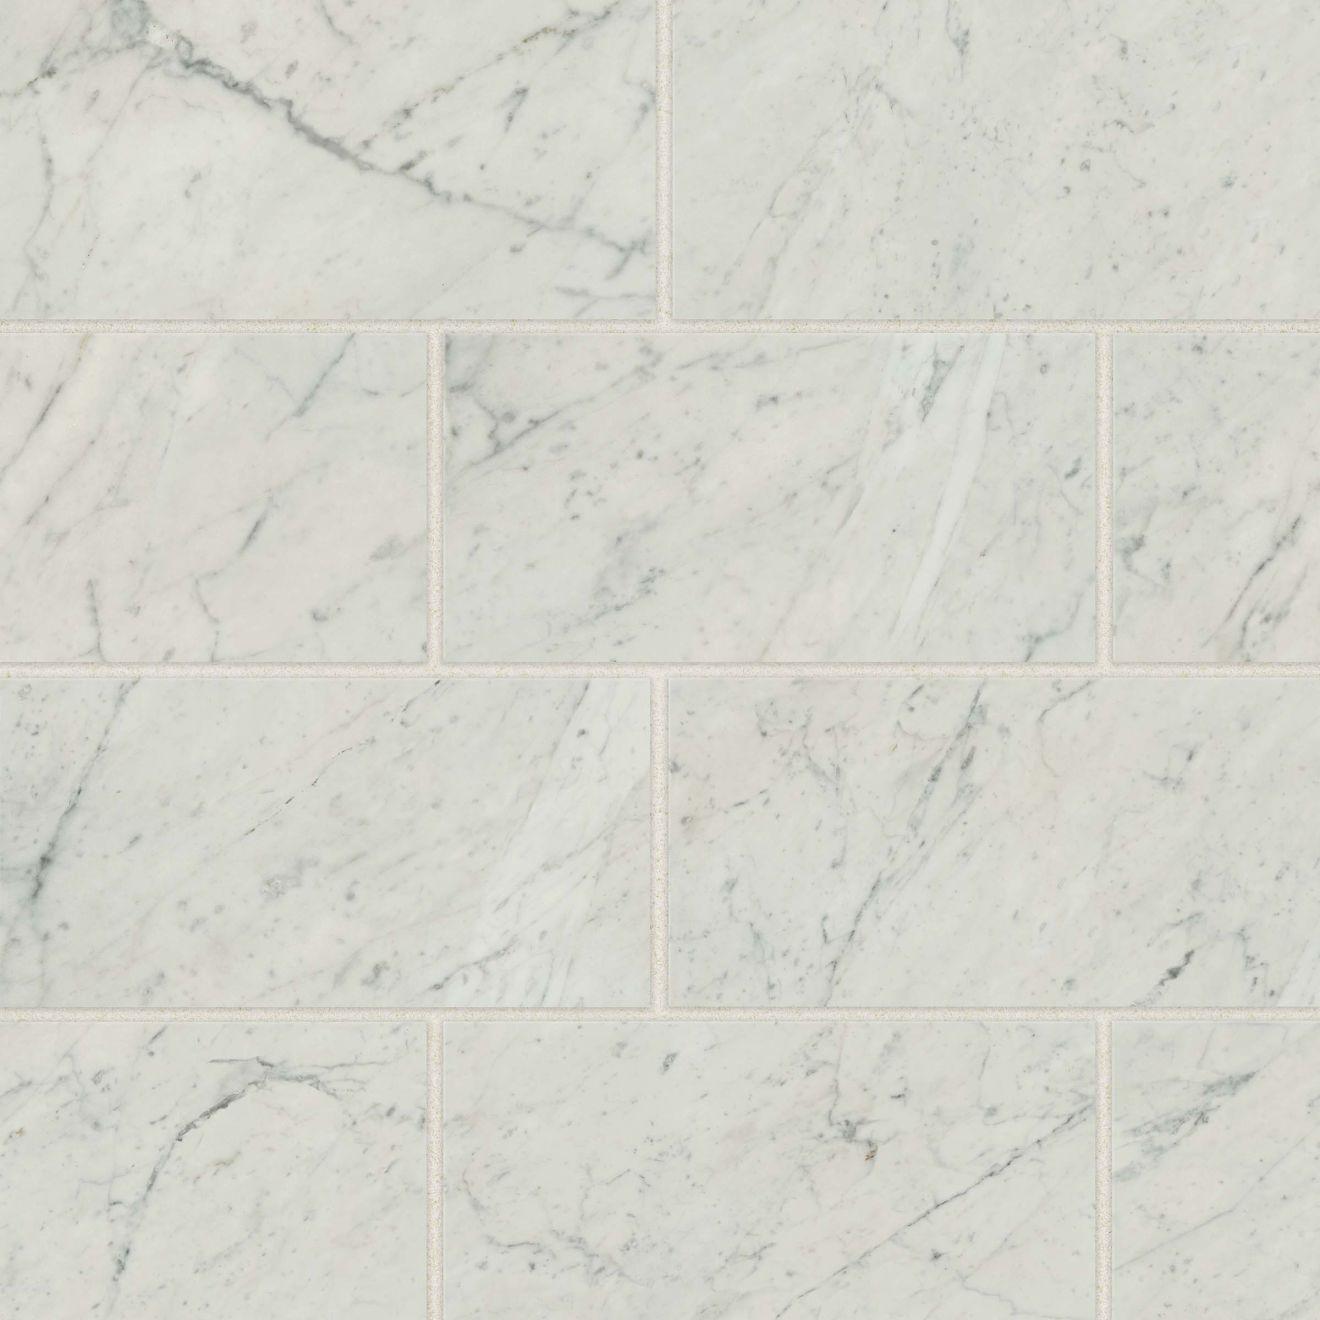 Classic 20 12 X 24 Floor Wall Tile In Bianco Carrara